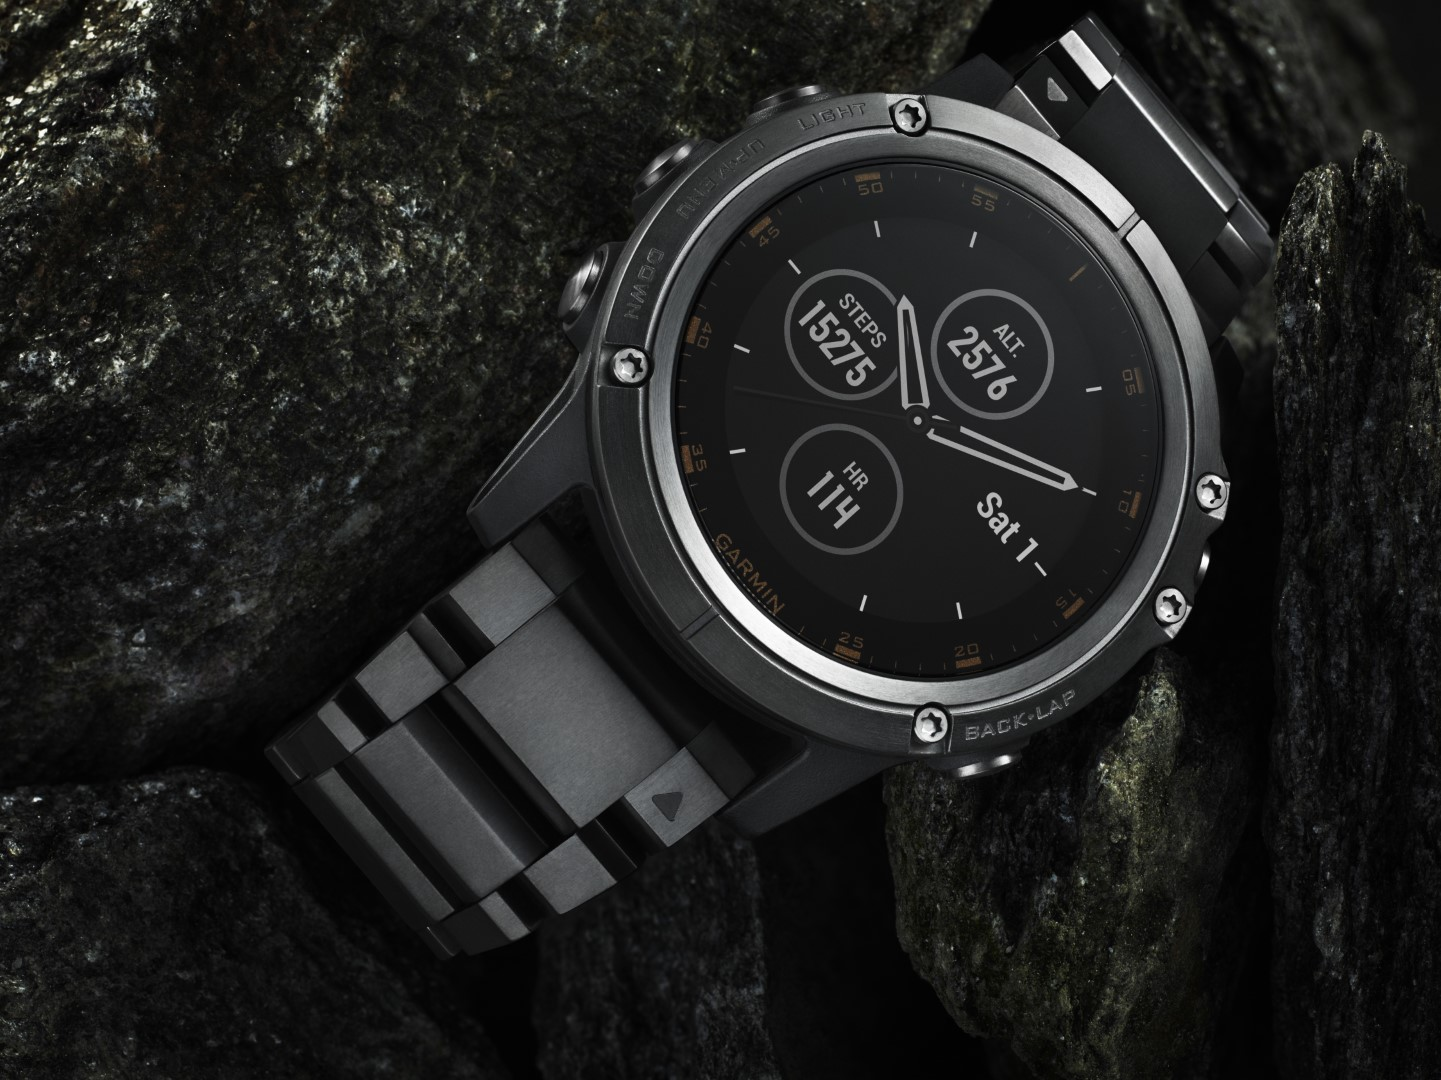 Garmin Fenix 5X Plus - Casavola Noci - Dettaglio Smartwatch